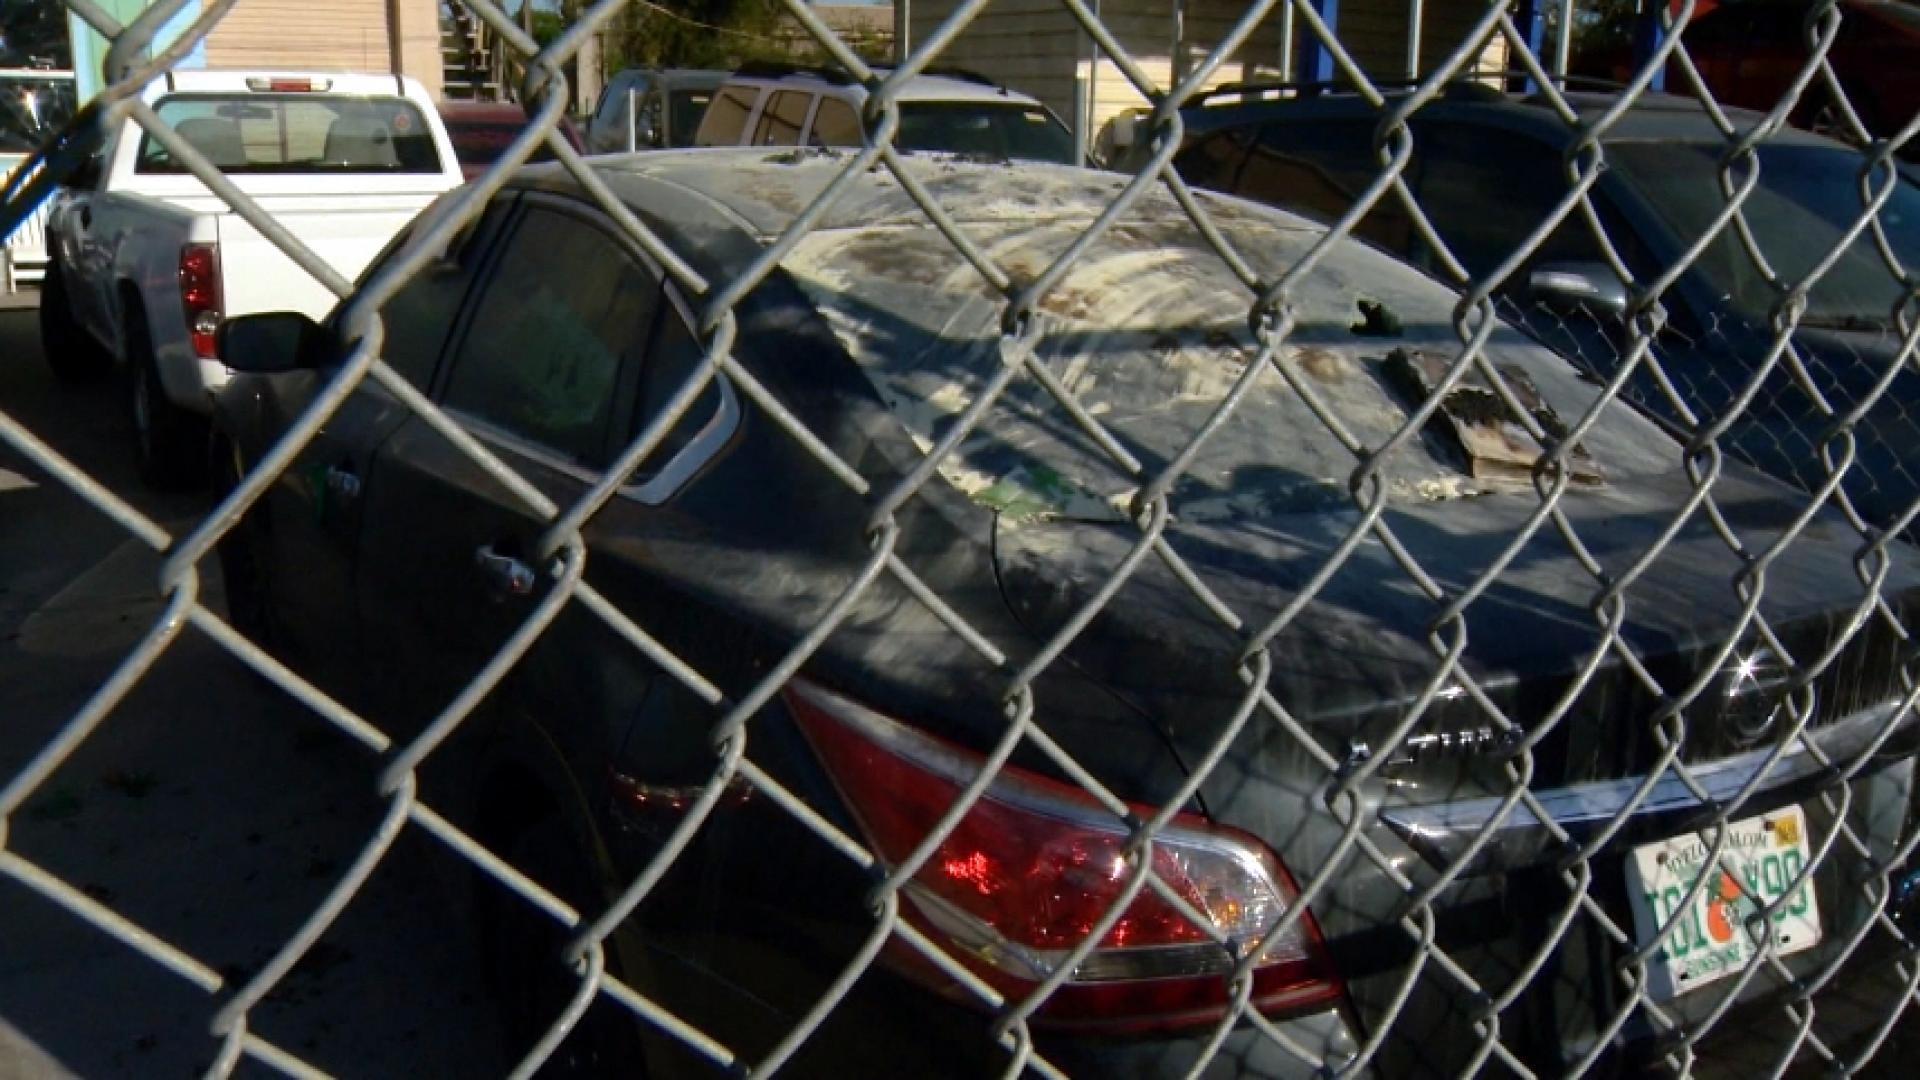 Florida Man Fire-Bombs Own Car